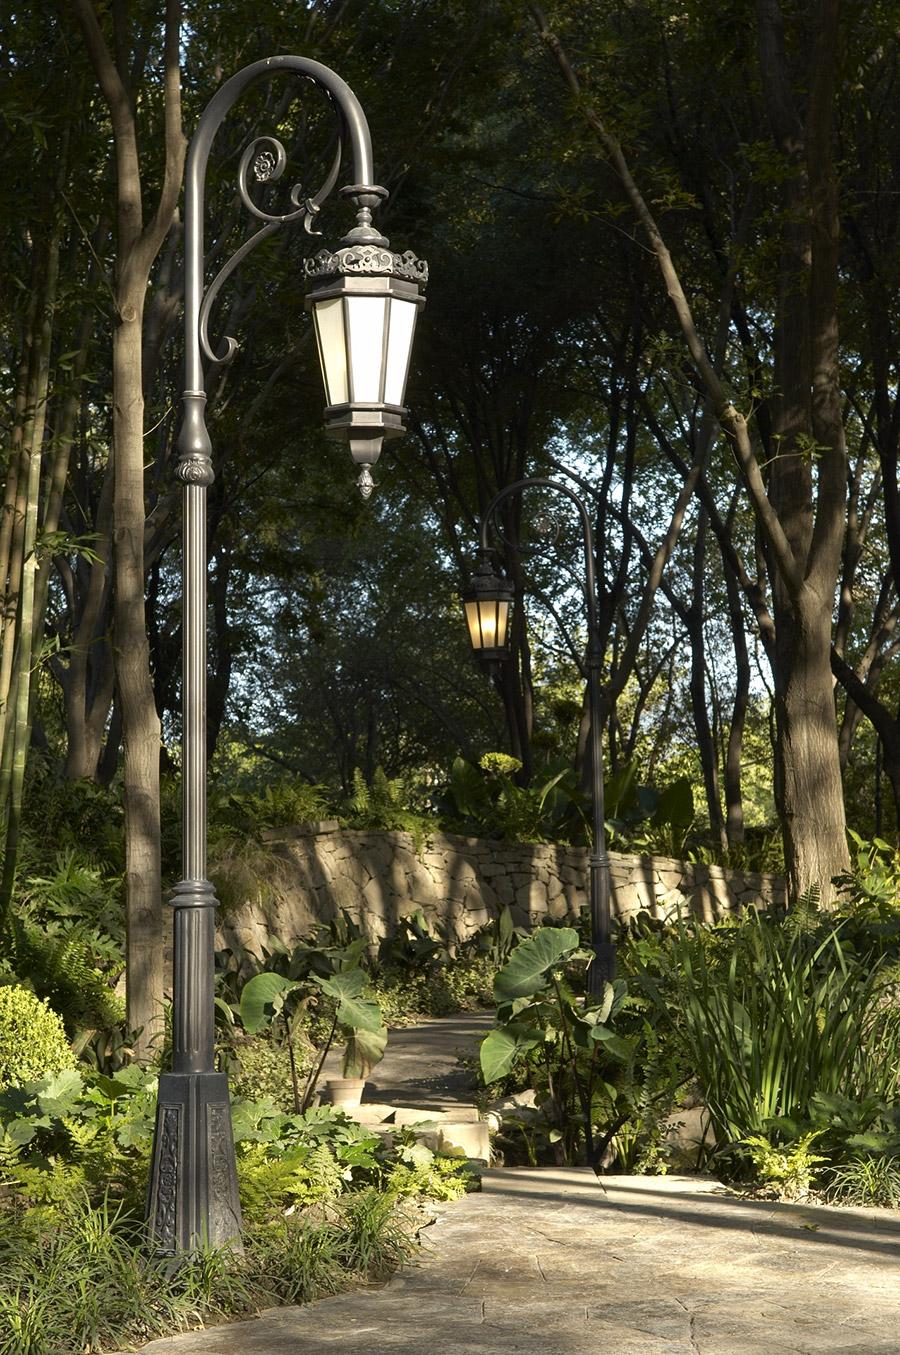 Chianti-OLS-CLA-E-003-classic--outdoor-Steel-Lighting-Post-Santa-Barbara-Residence-(12)